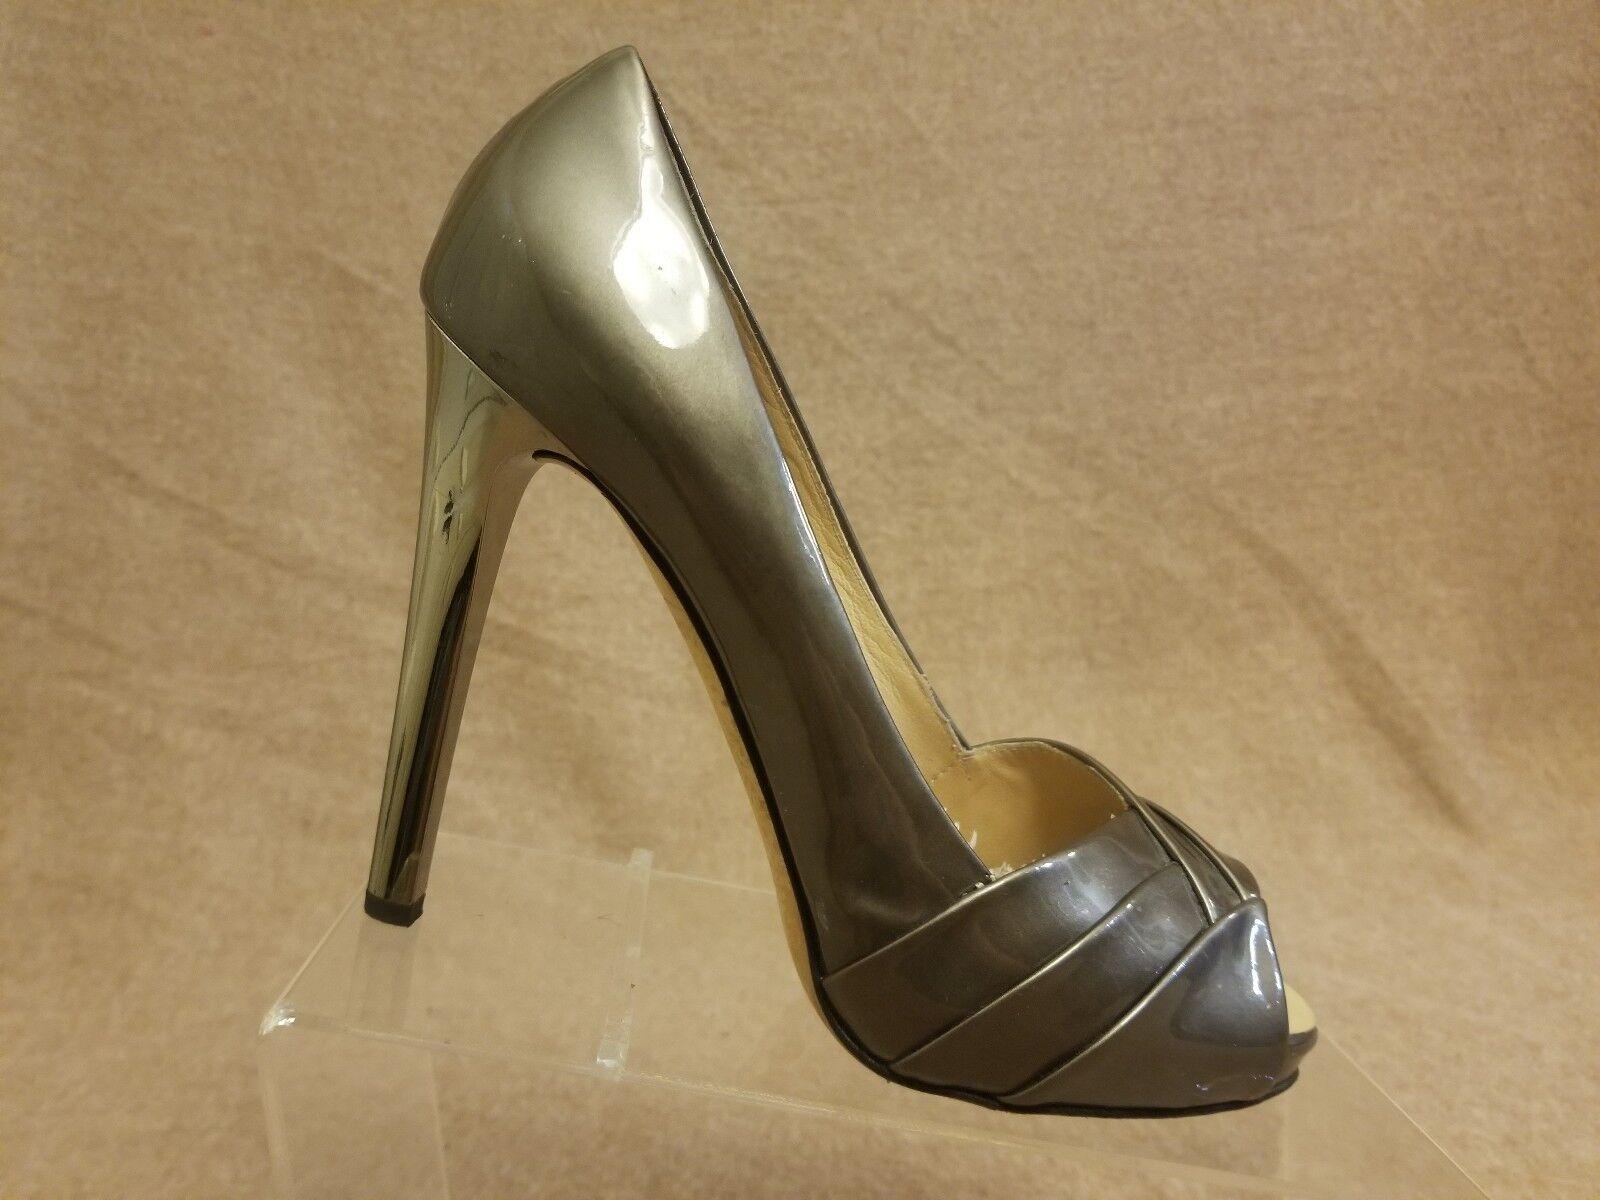 Giuseppe Zanotti Women Bronze Patent Leather Pump High Heel Peep Toe shoes Sz 9B